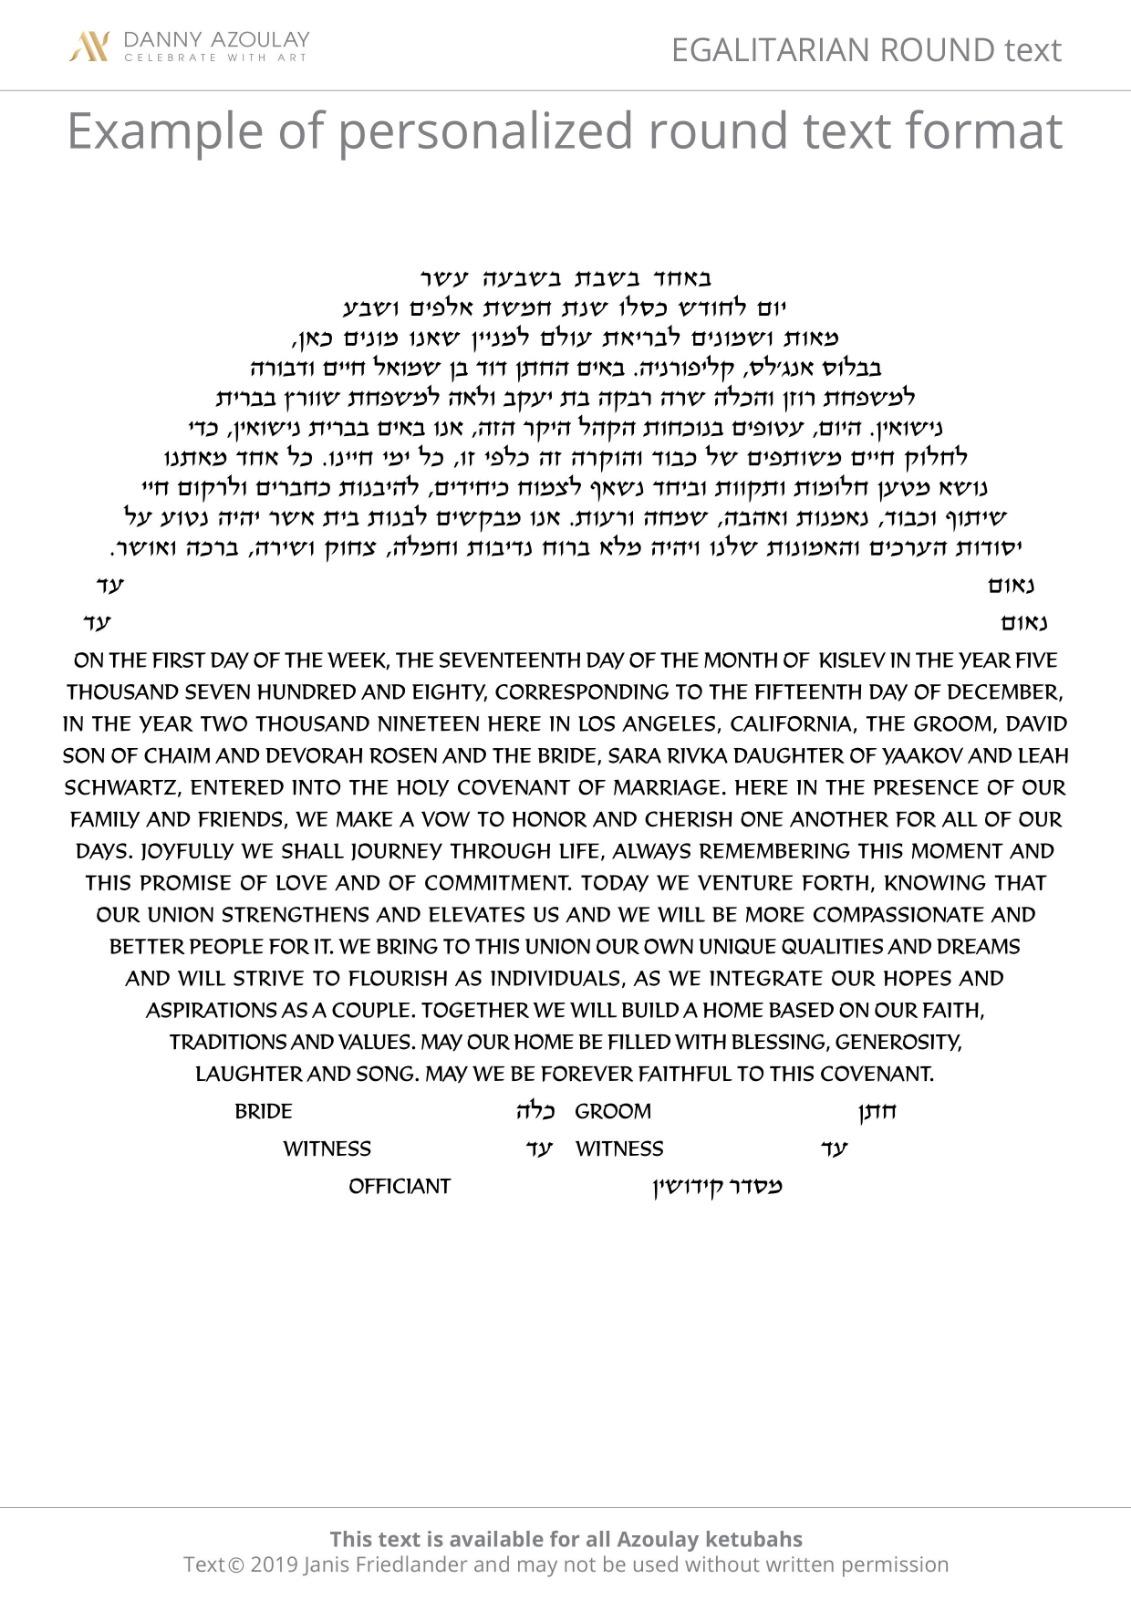 text Egalitarian for ketubah